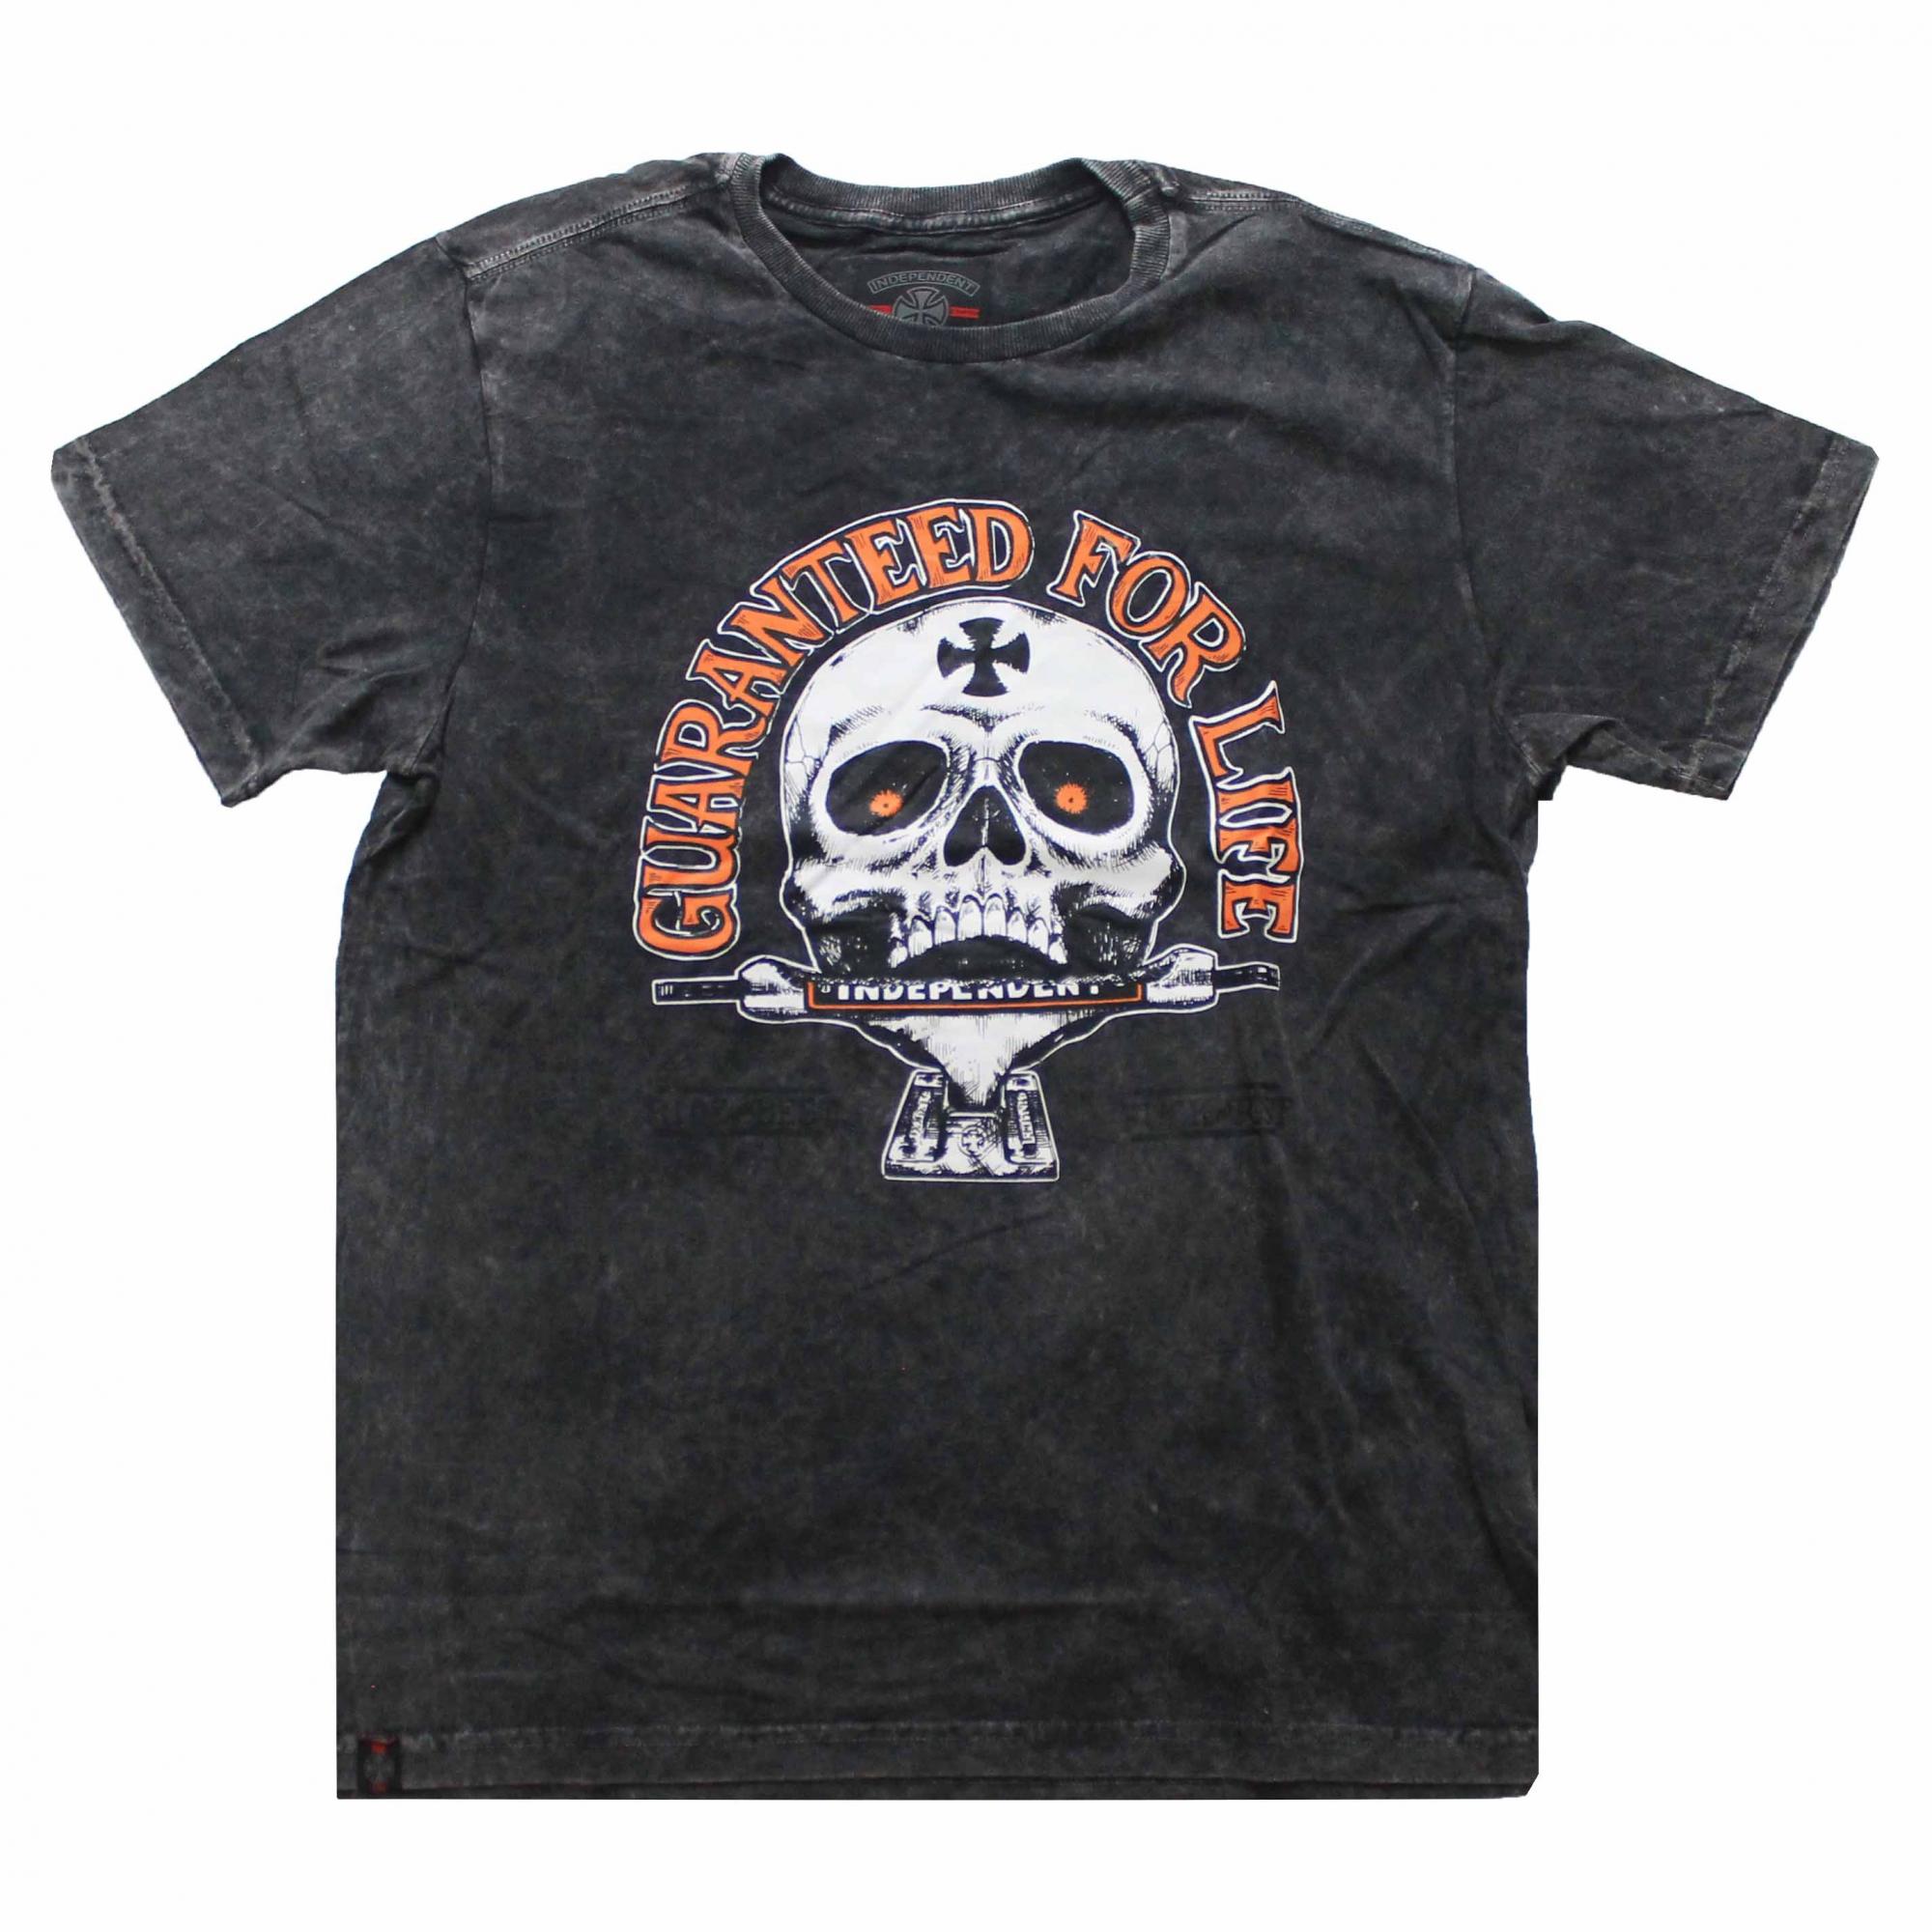 Camiseta Independent Guaranteed - Preto Estonado